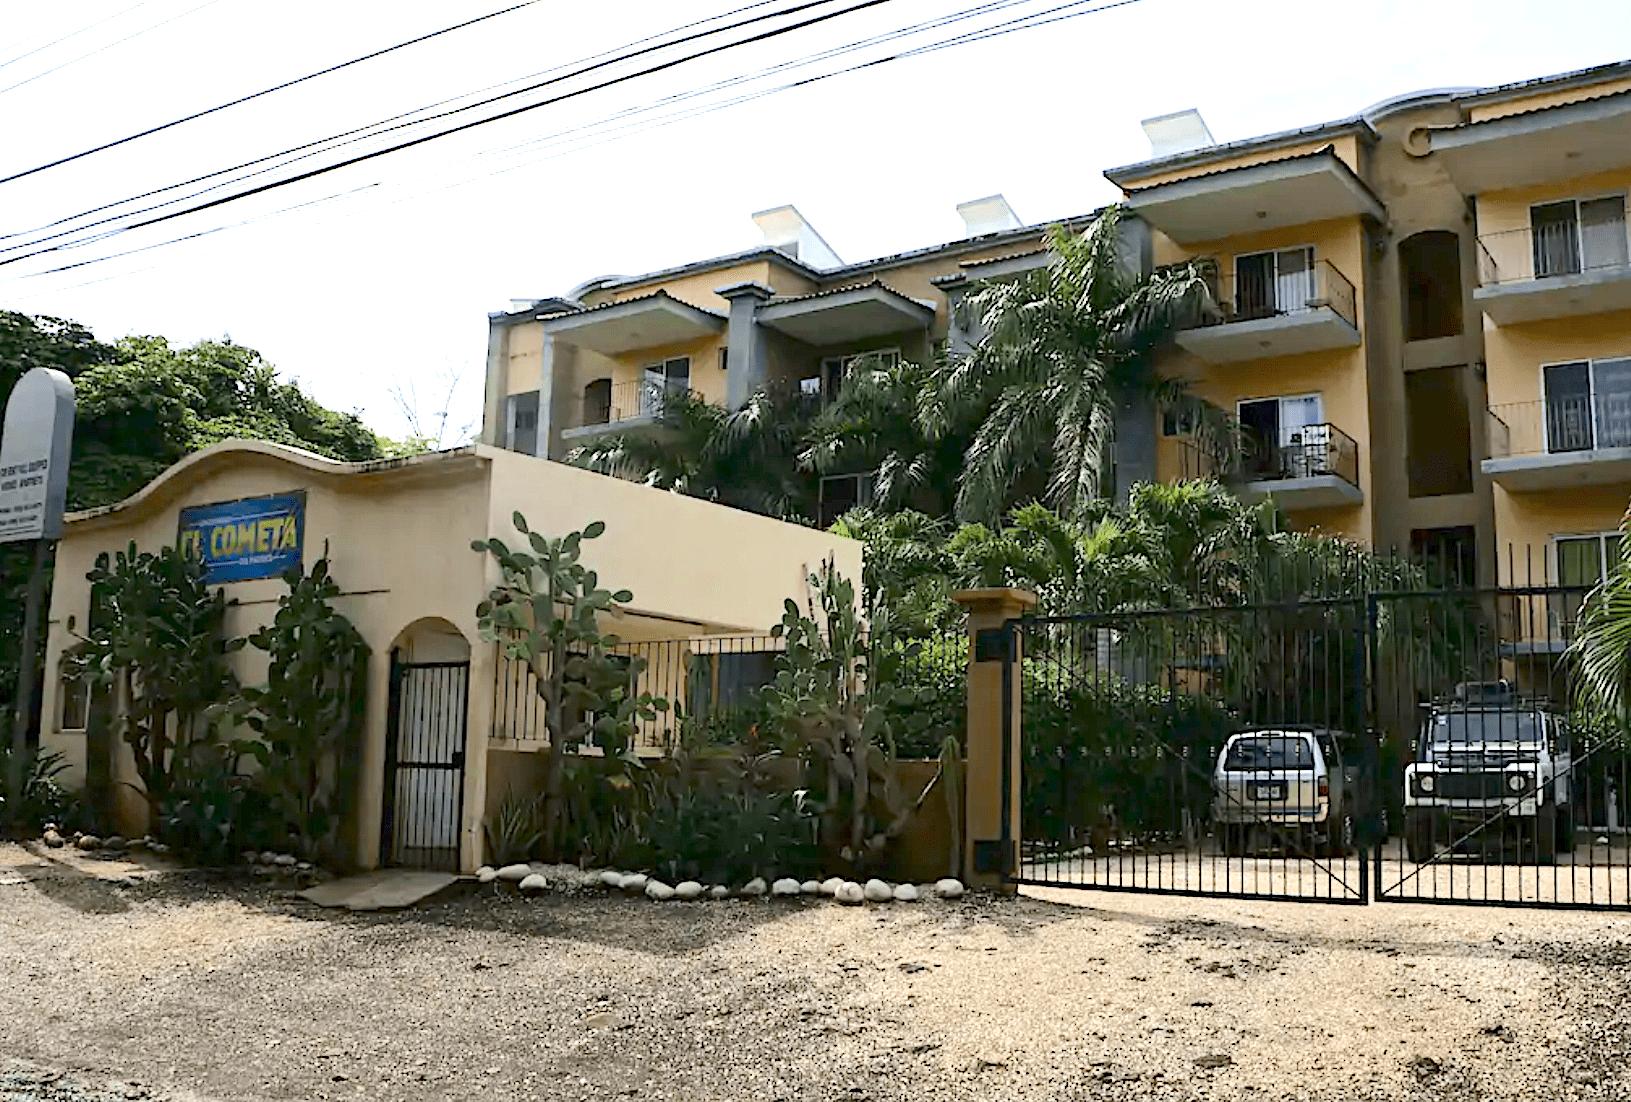 LC Common - Exterior